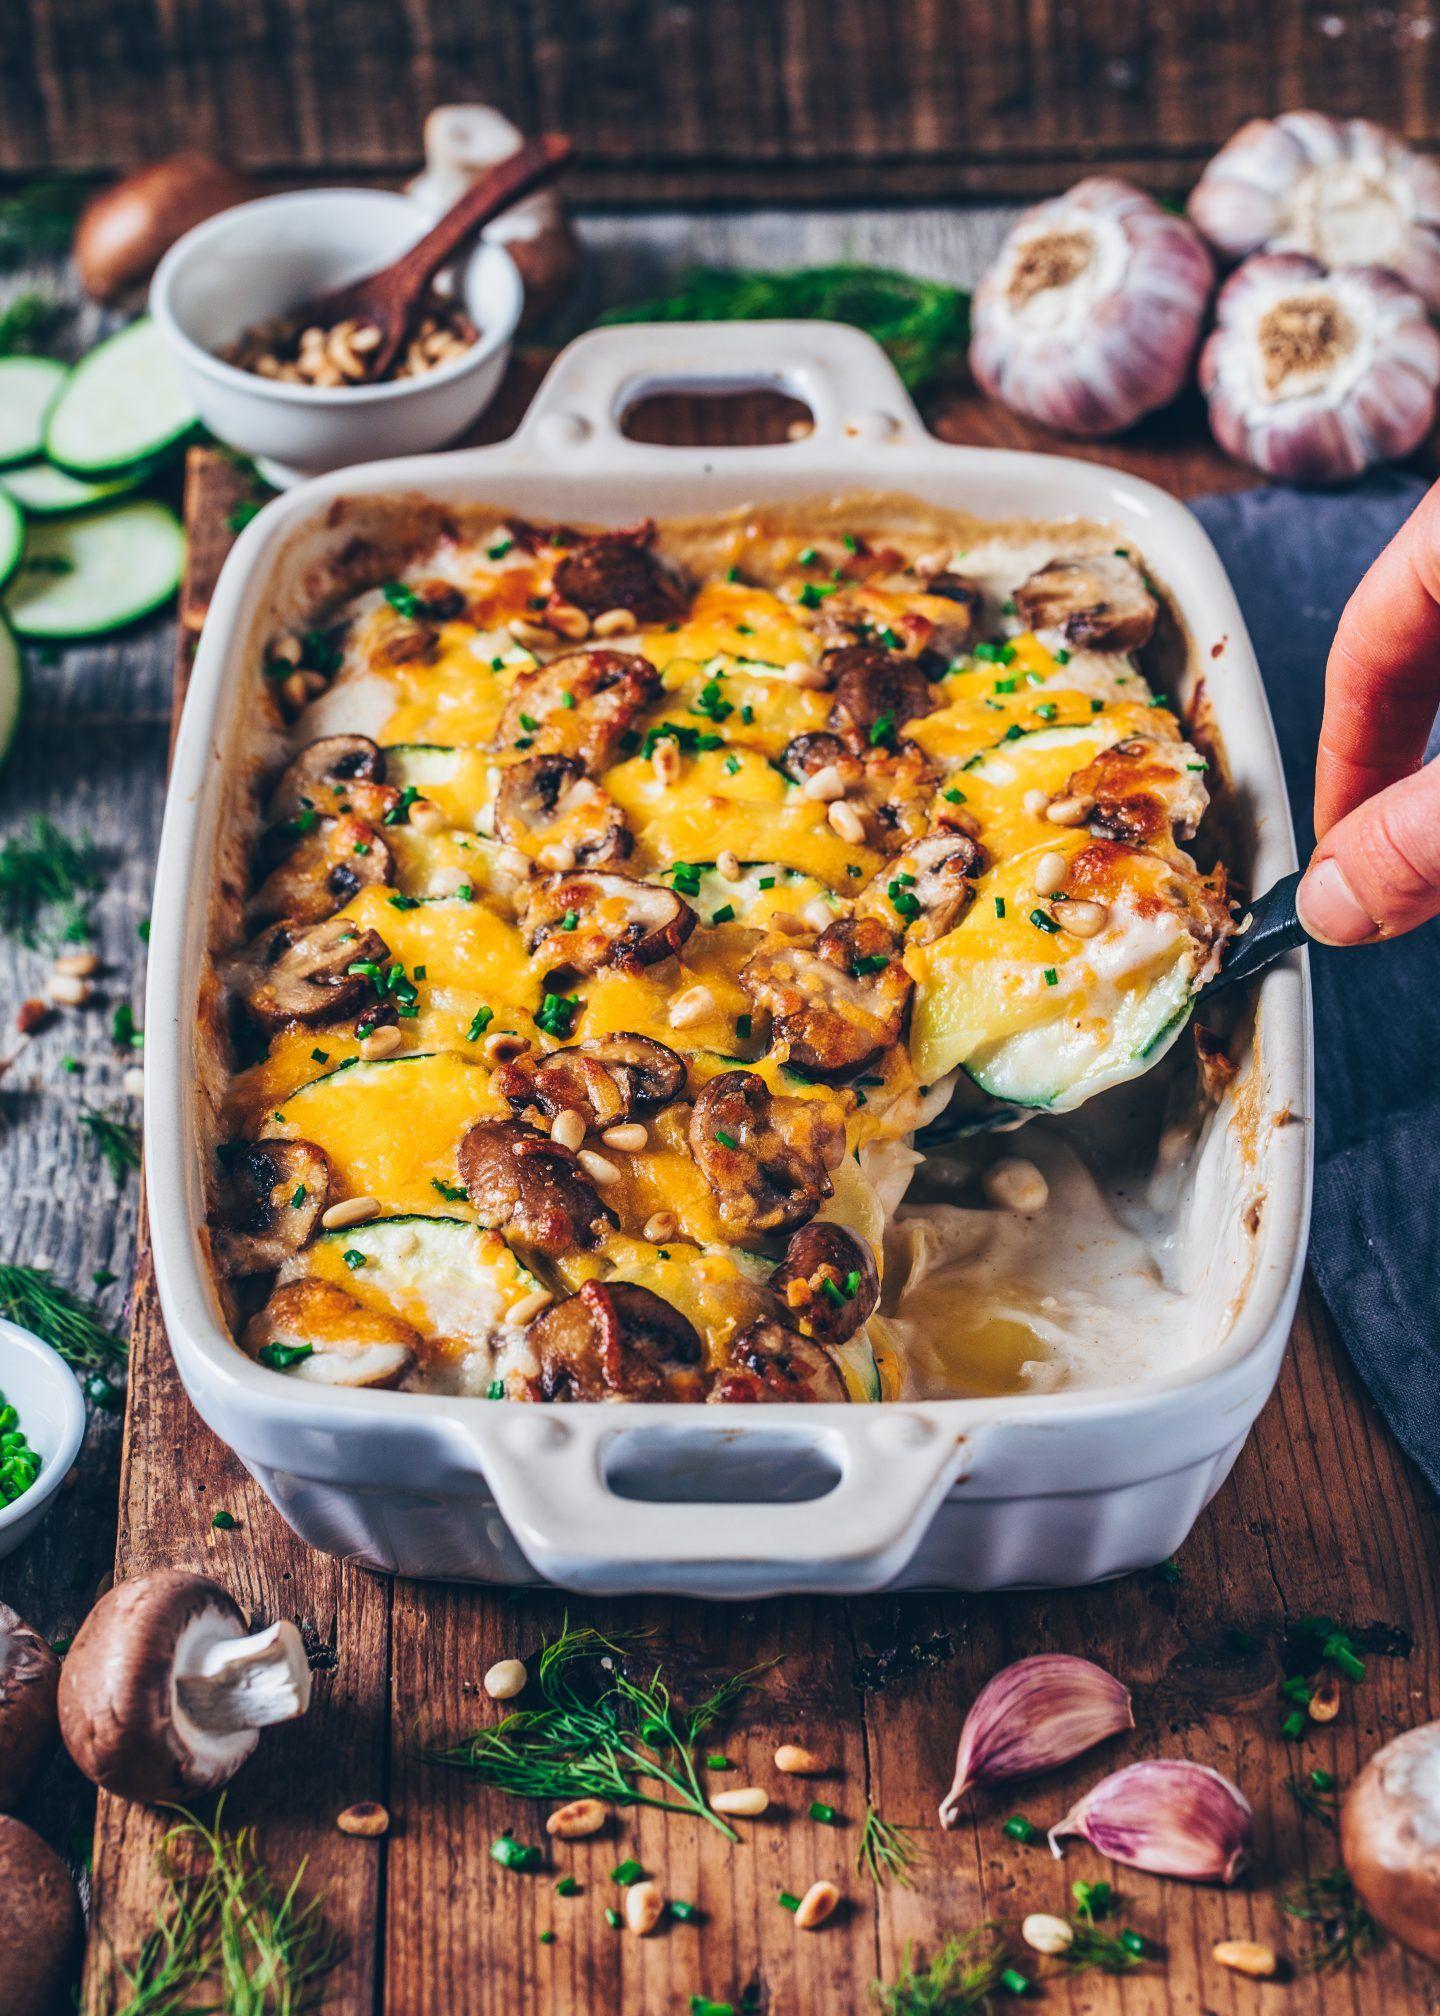 Vegan Potato Bake Potatoes Au Gratin